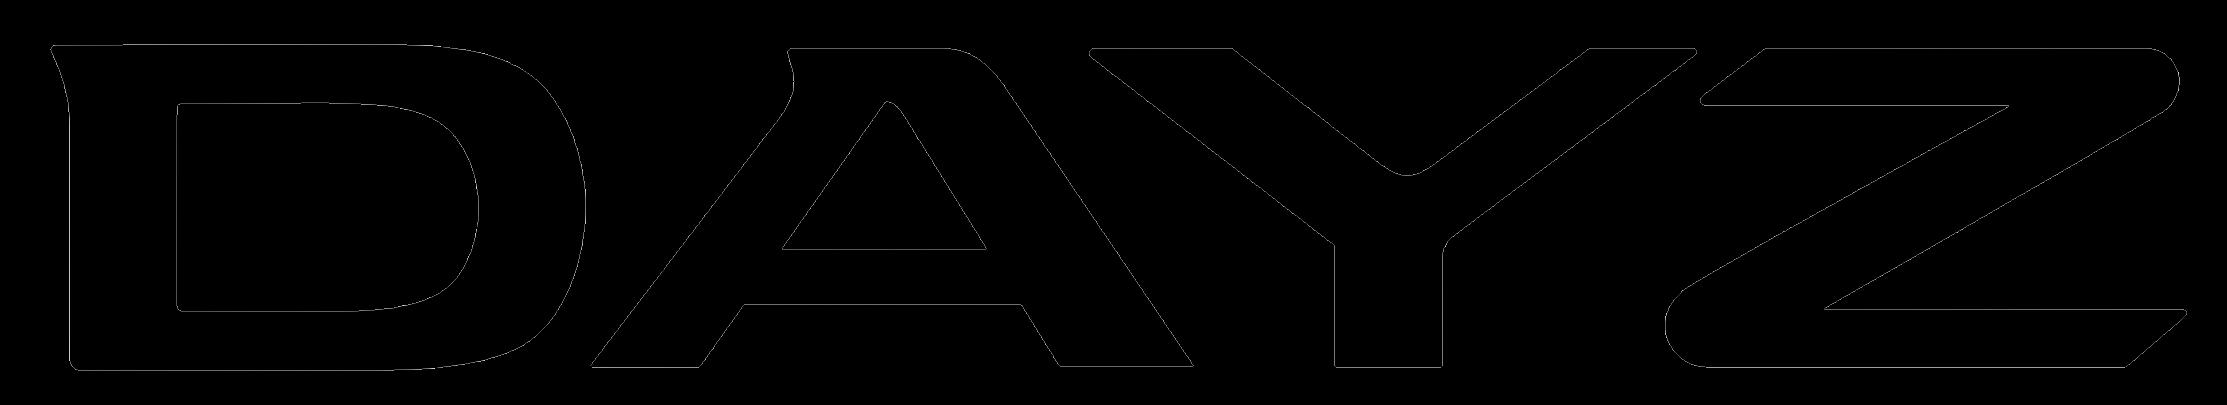 File:NISSAN DAYZ logo.png.